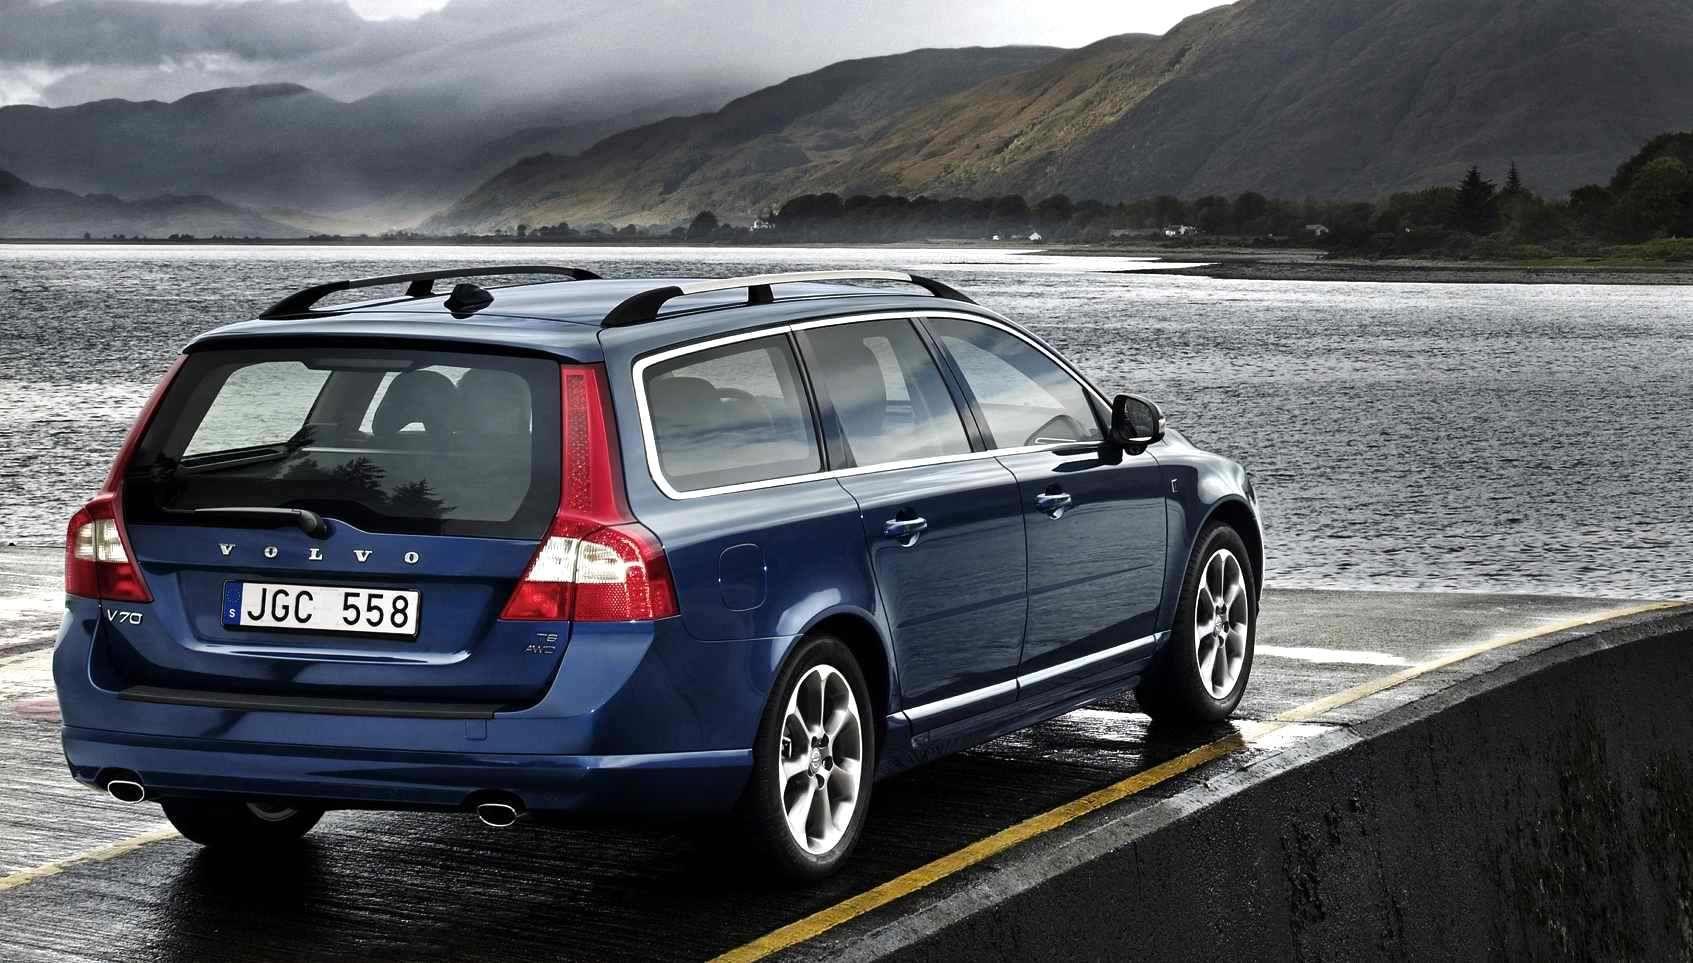 Volvo v70 r awd not a minivan pinterest volvo v70 volvo and cars